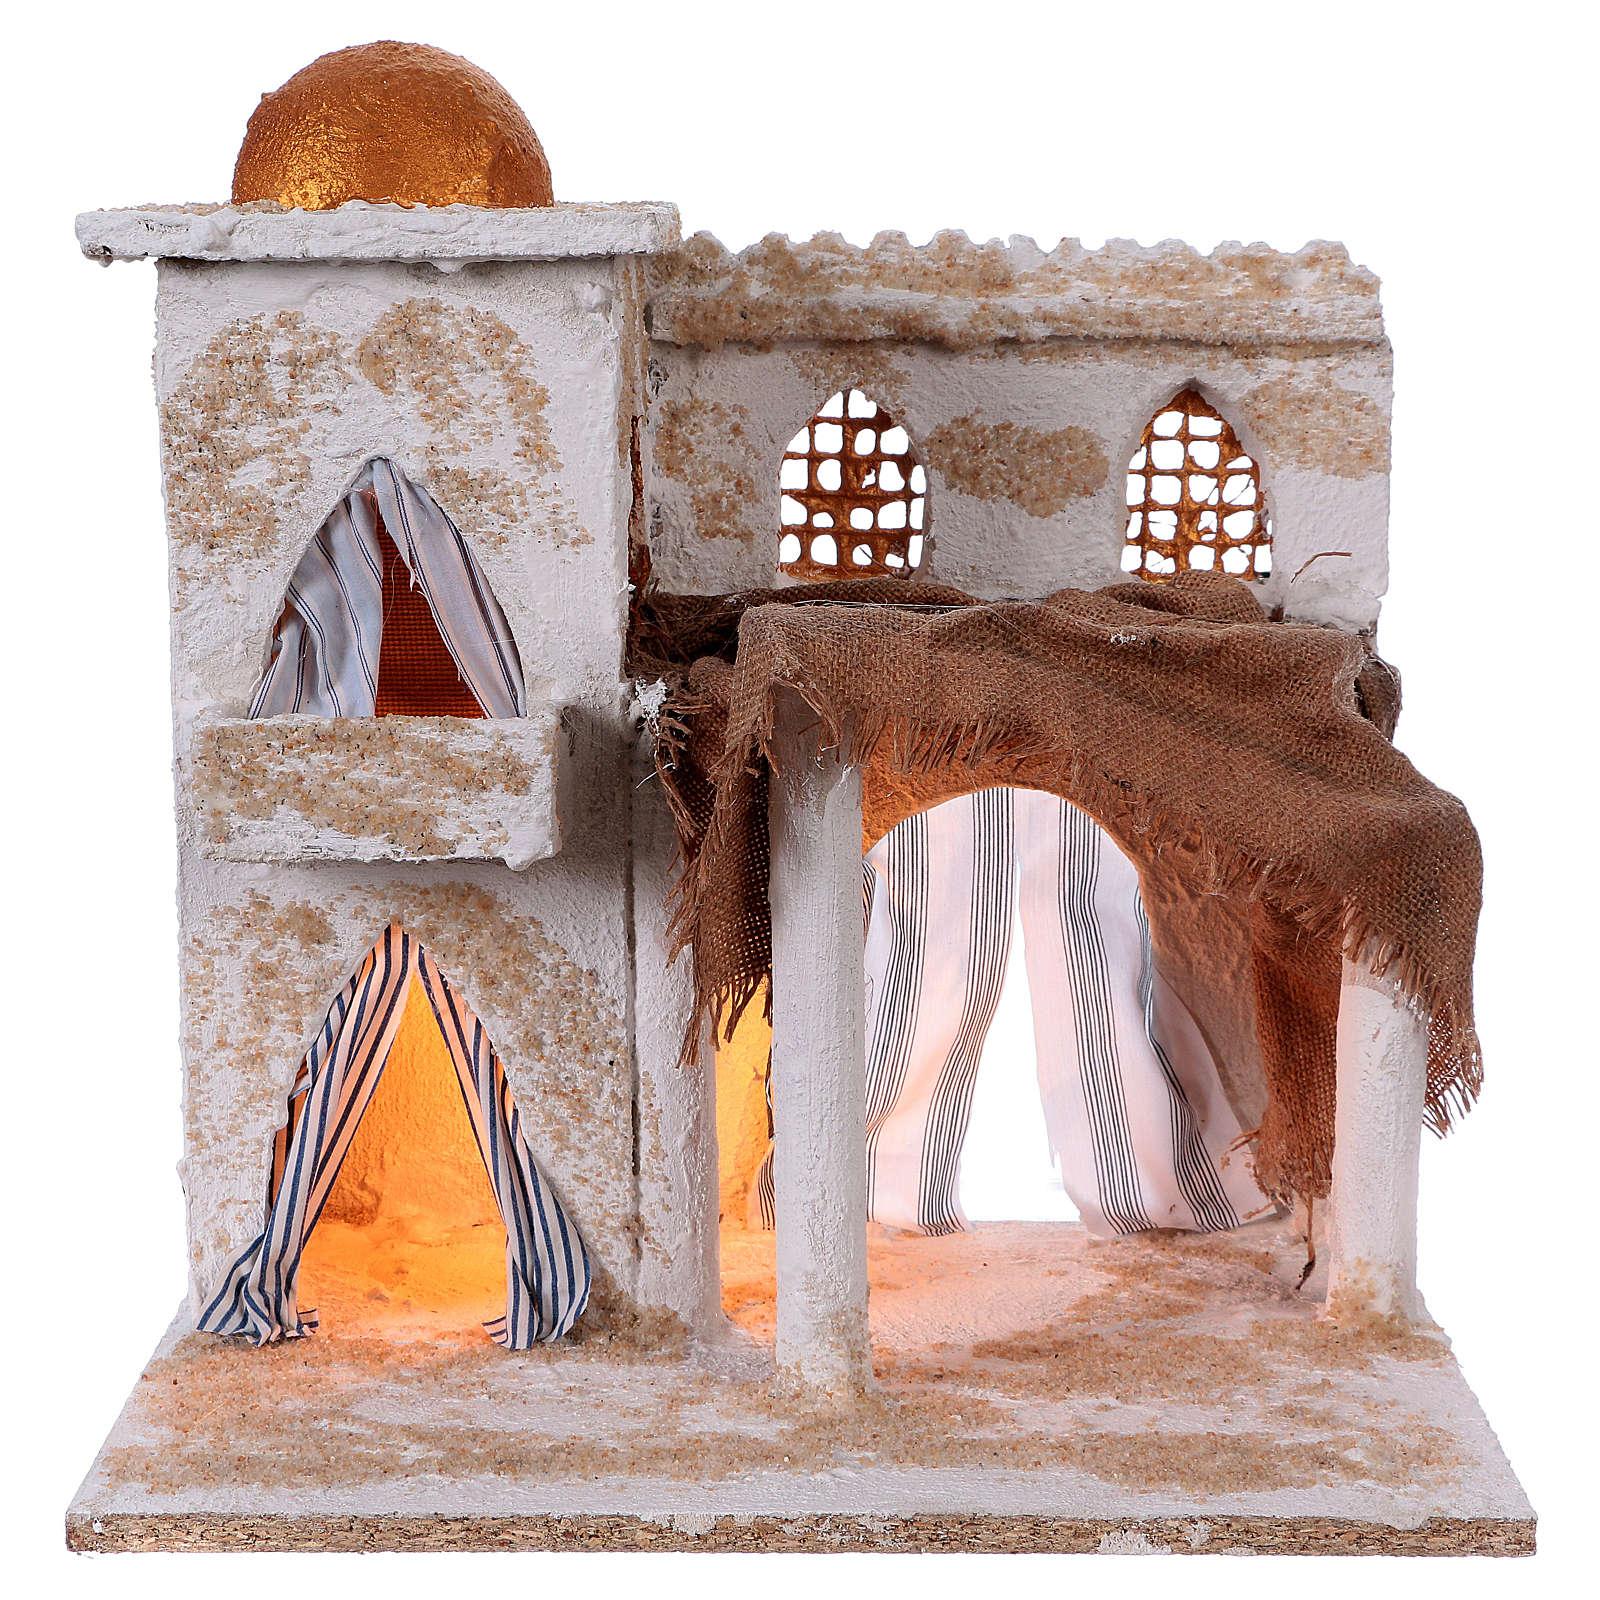 Casa árabe con columnas torre cúpula luces 35x35x25 cm belén Nápoles 4